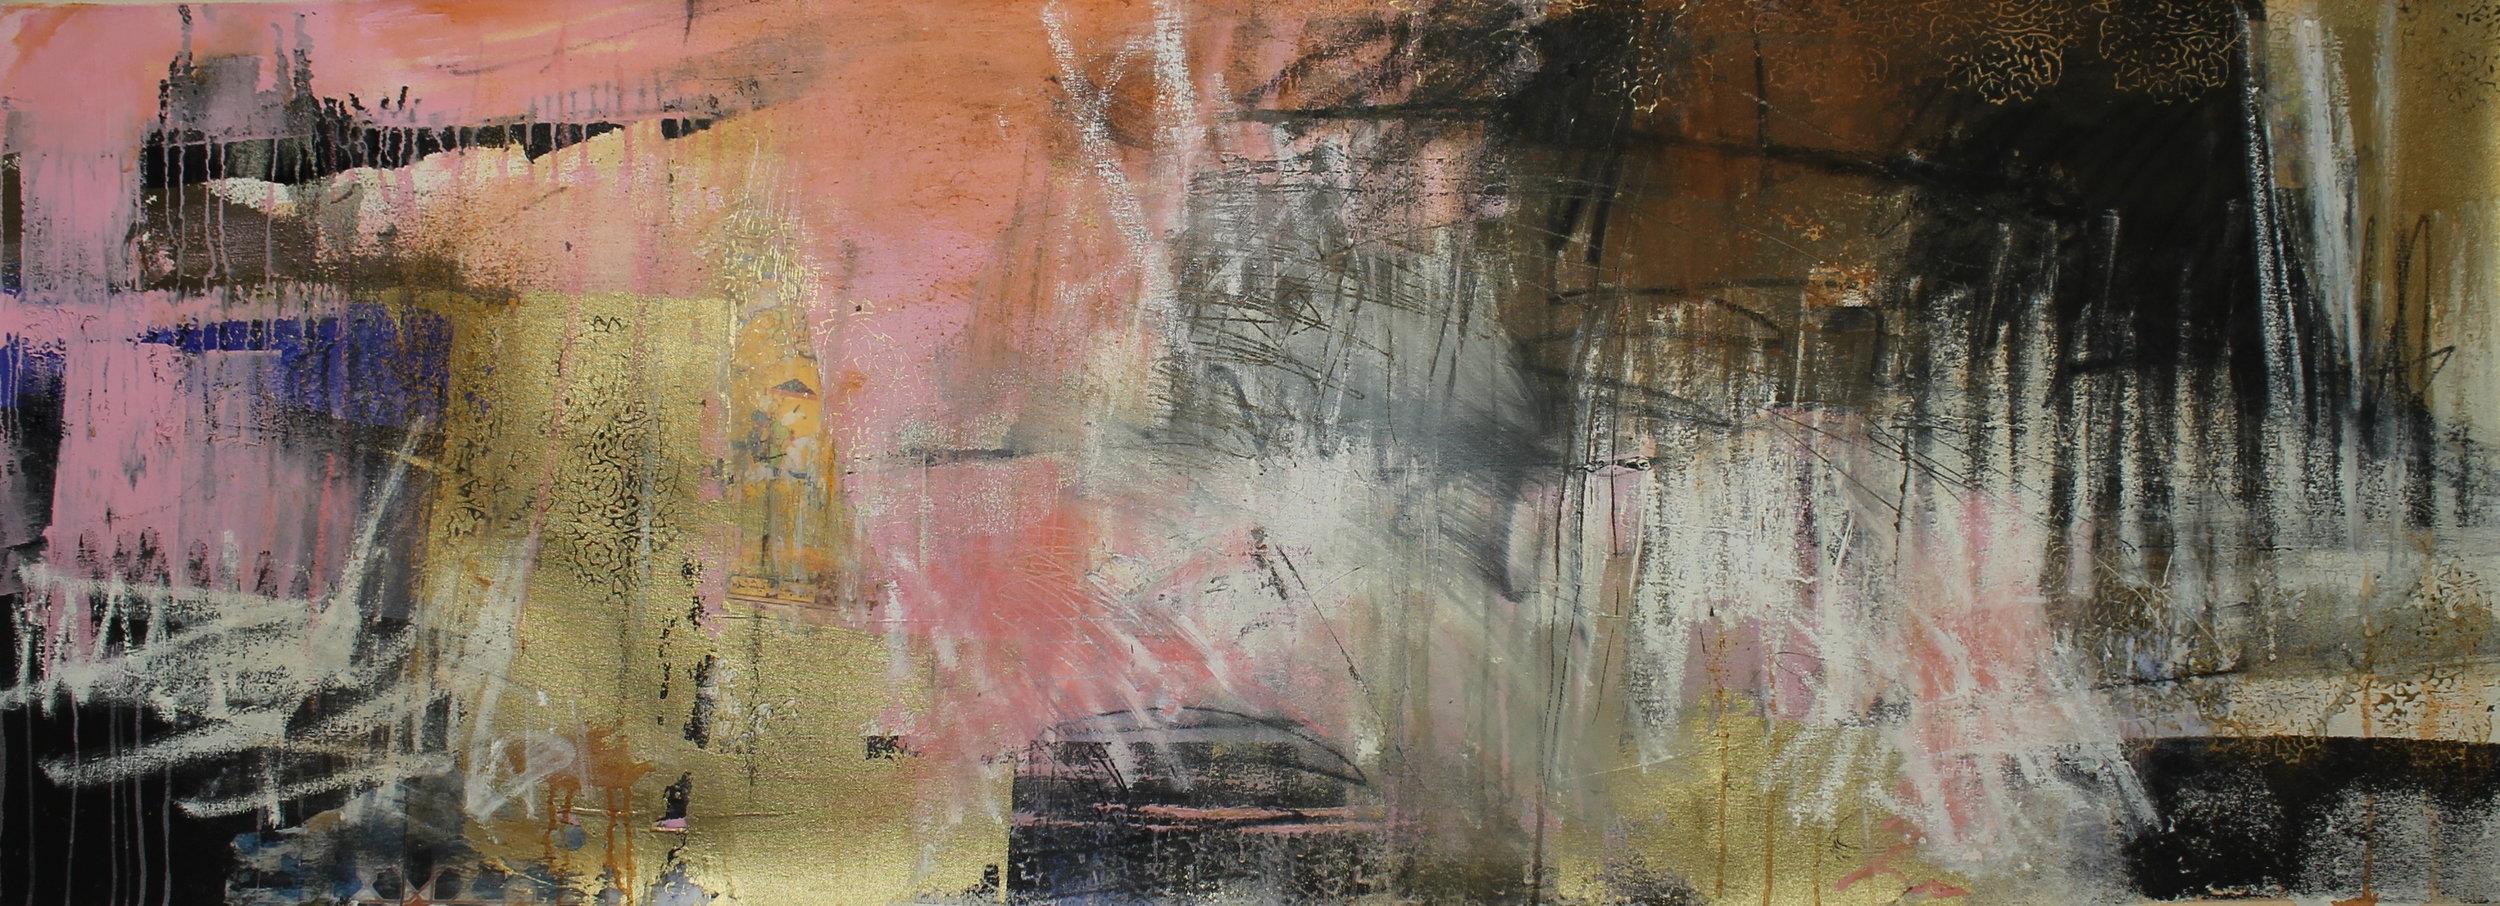 """Waiting""  76 x 183cm  Oil and Acrylic on canvas"